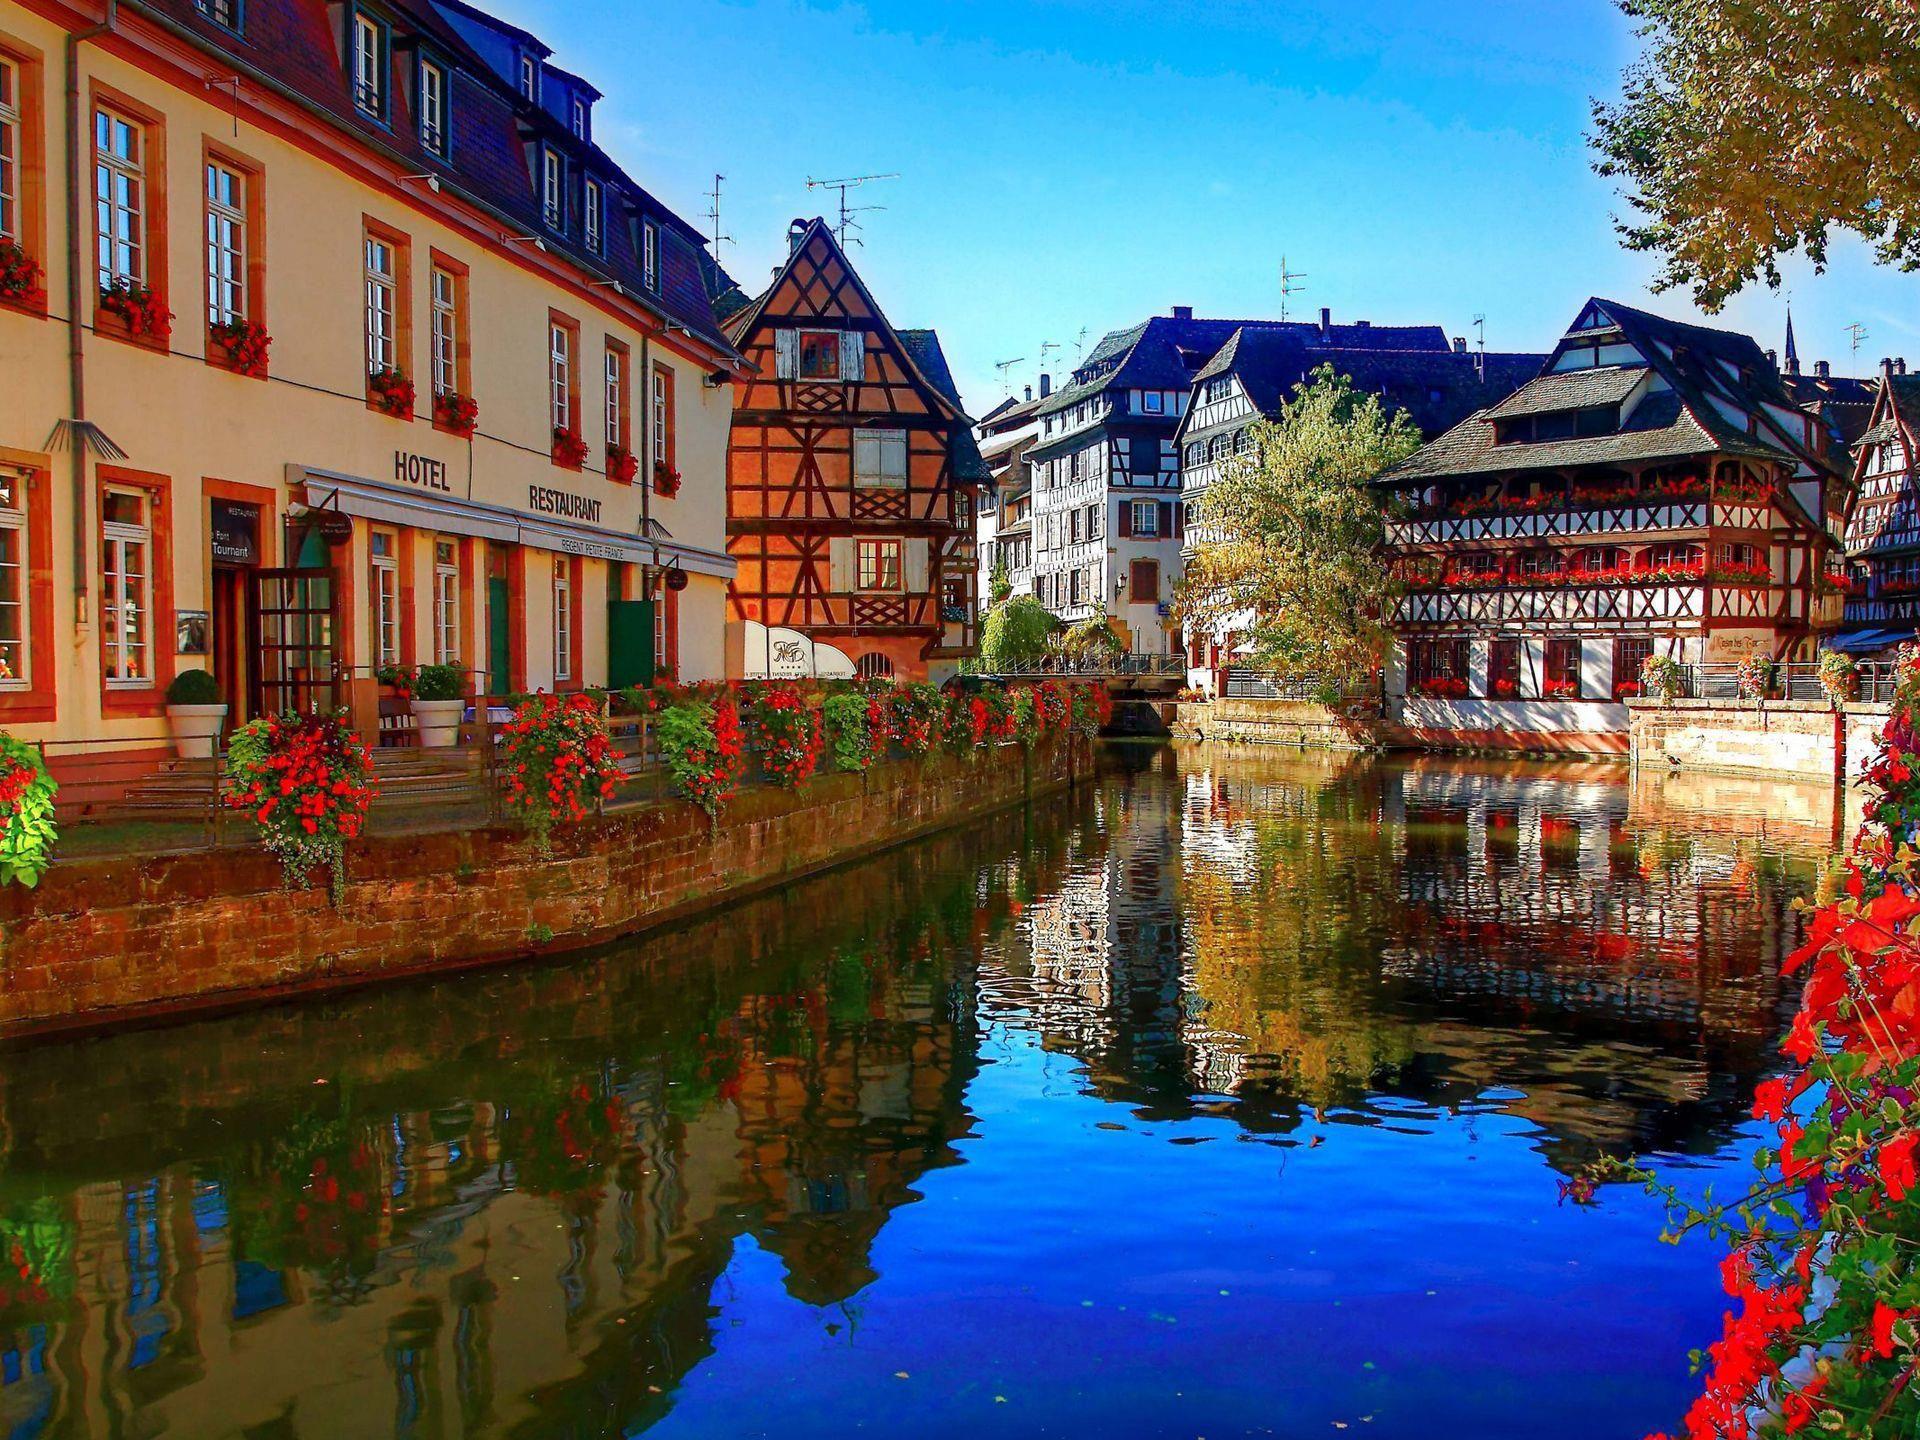 Strasbourg Beauty   Paesaggi, Viaggi, Luoghi